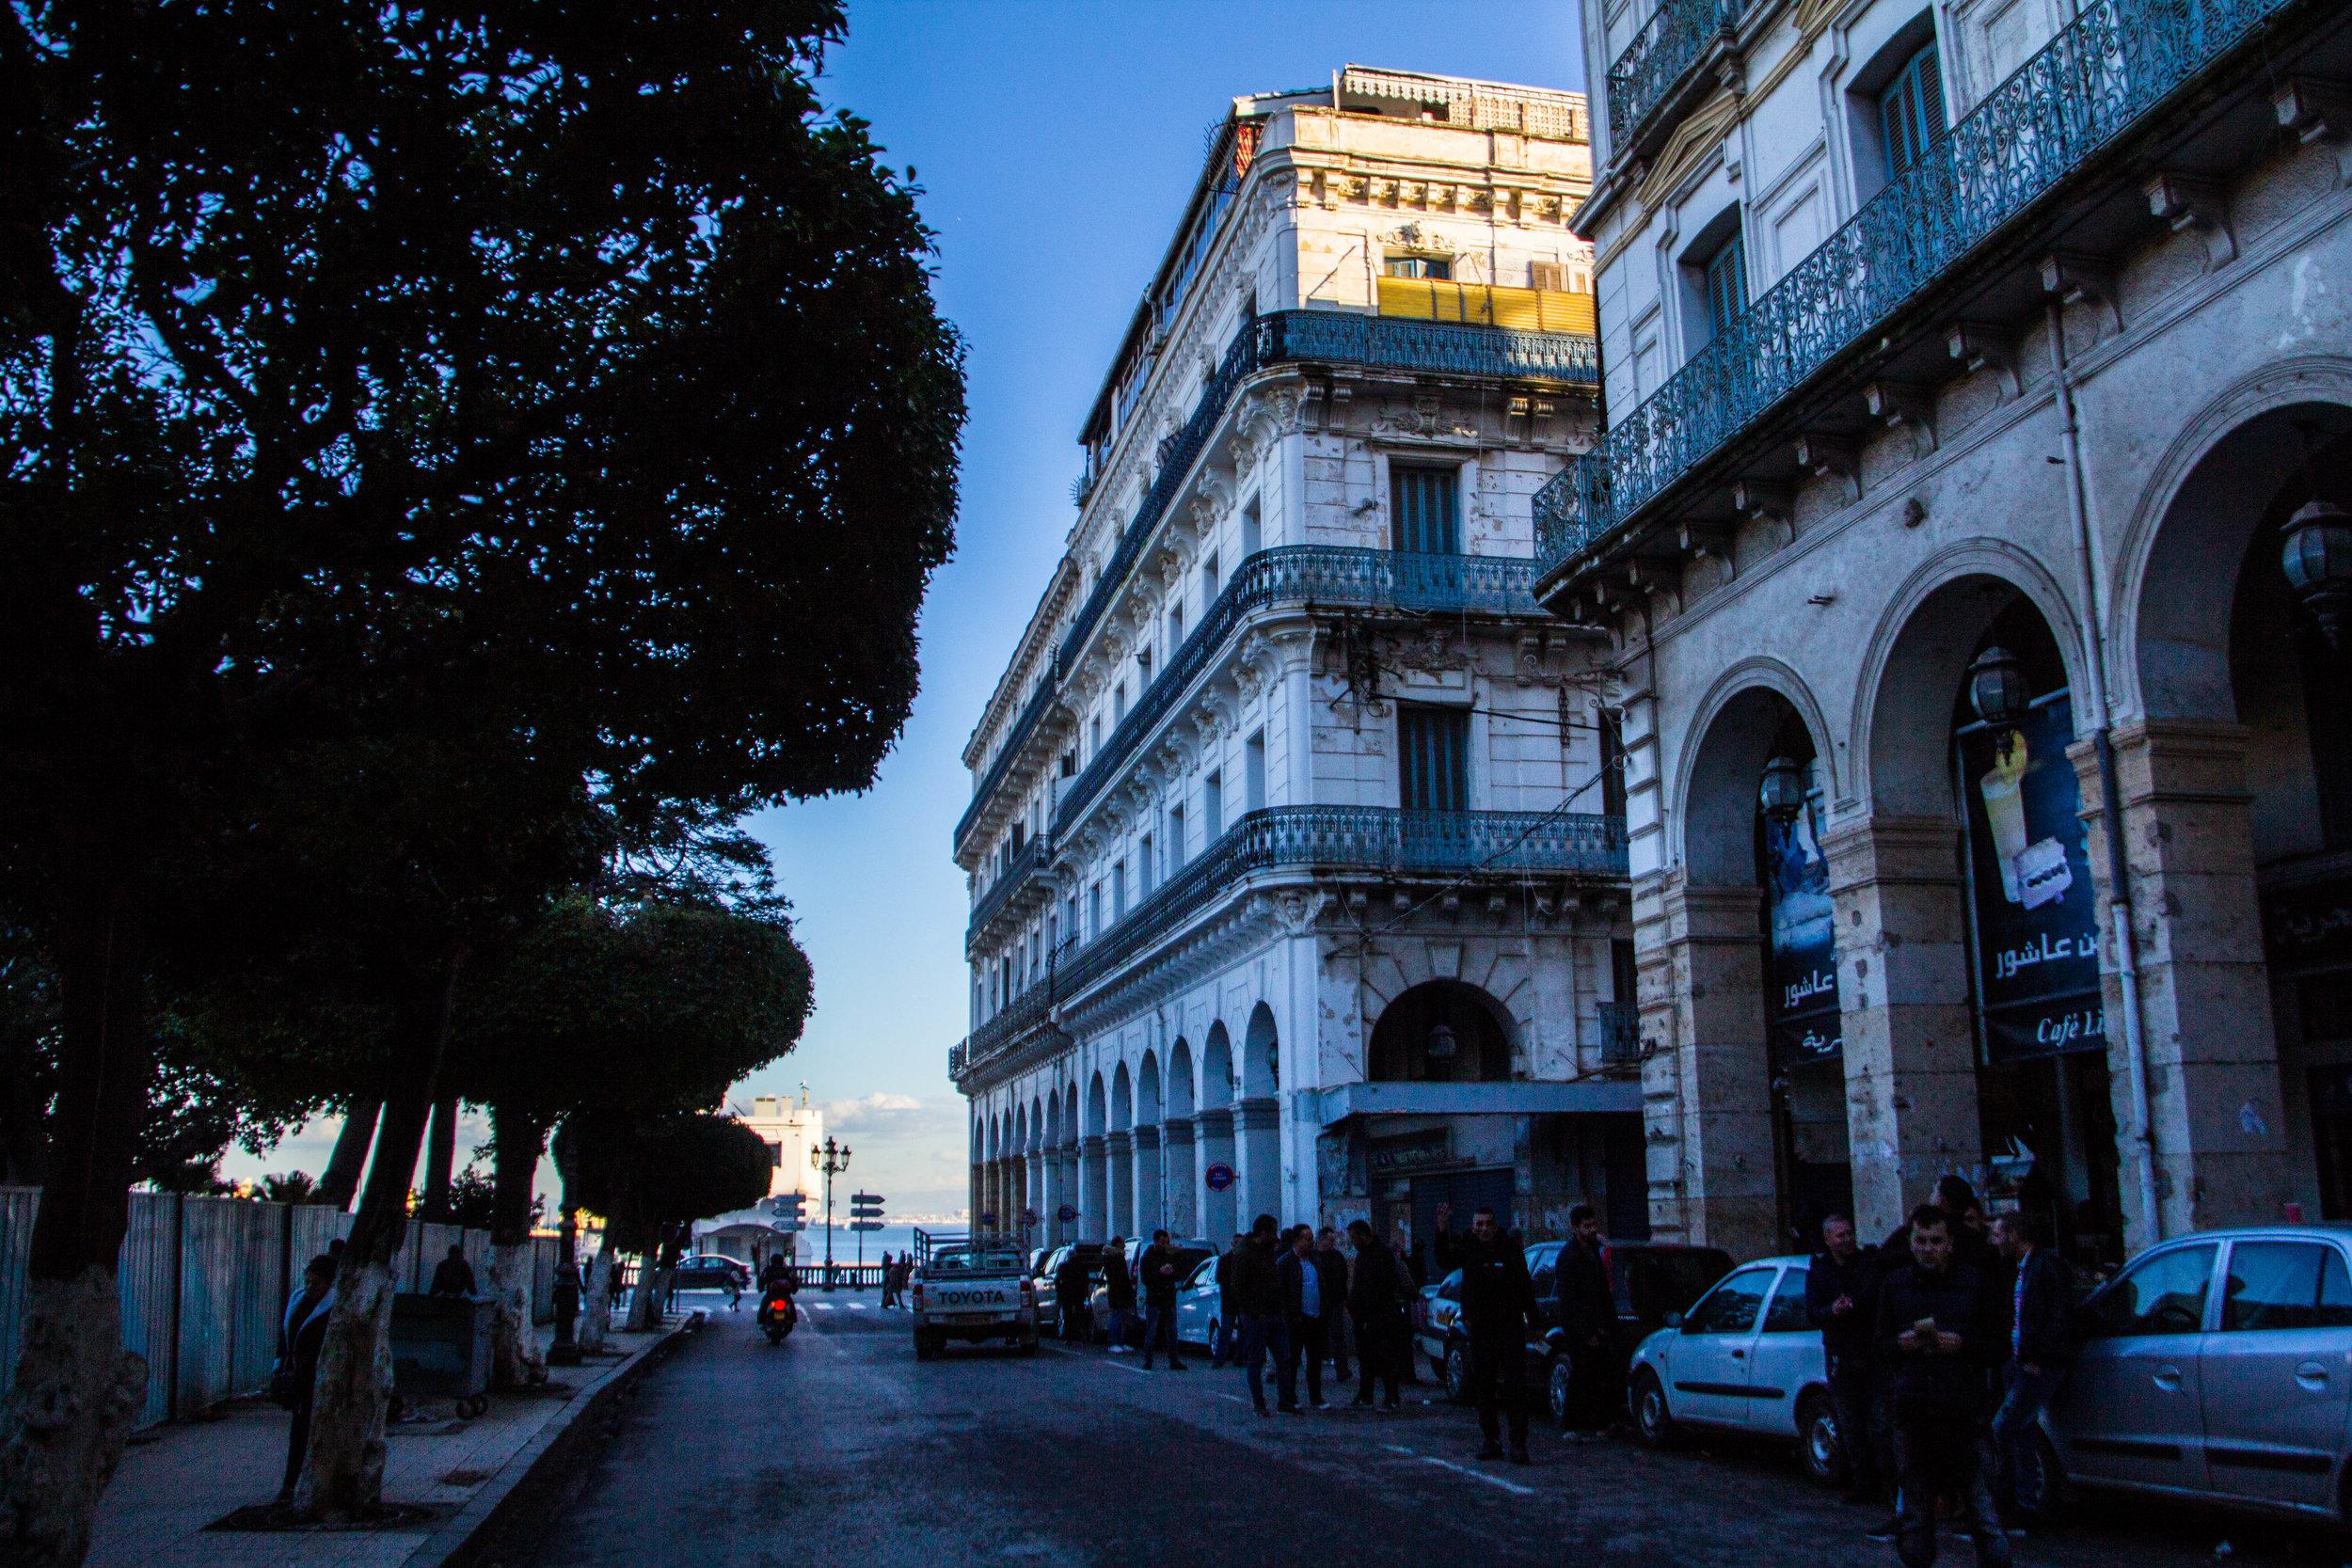 streets-algiers-algeria-33.jpg